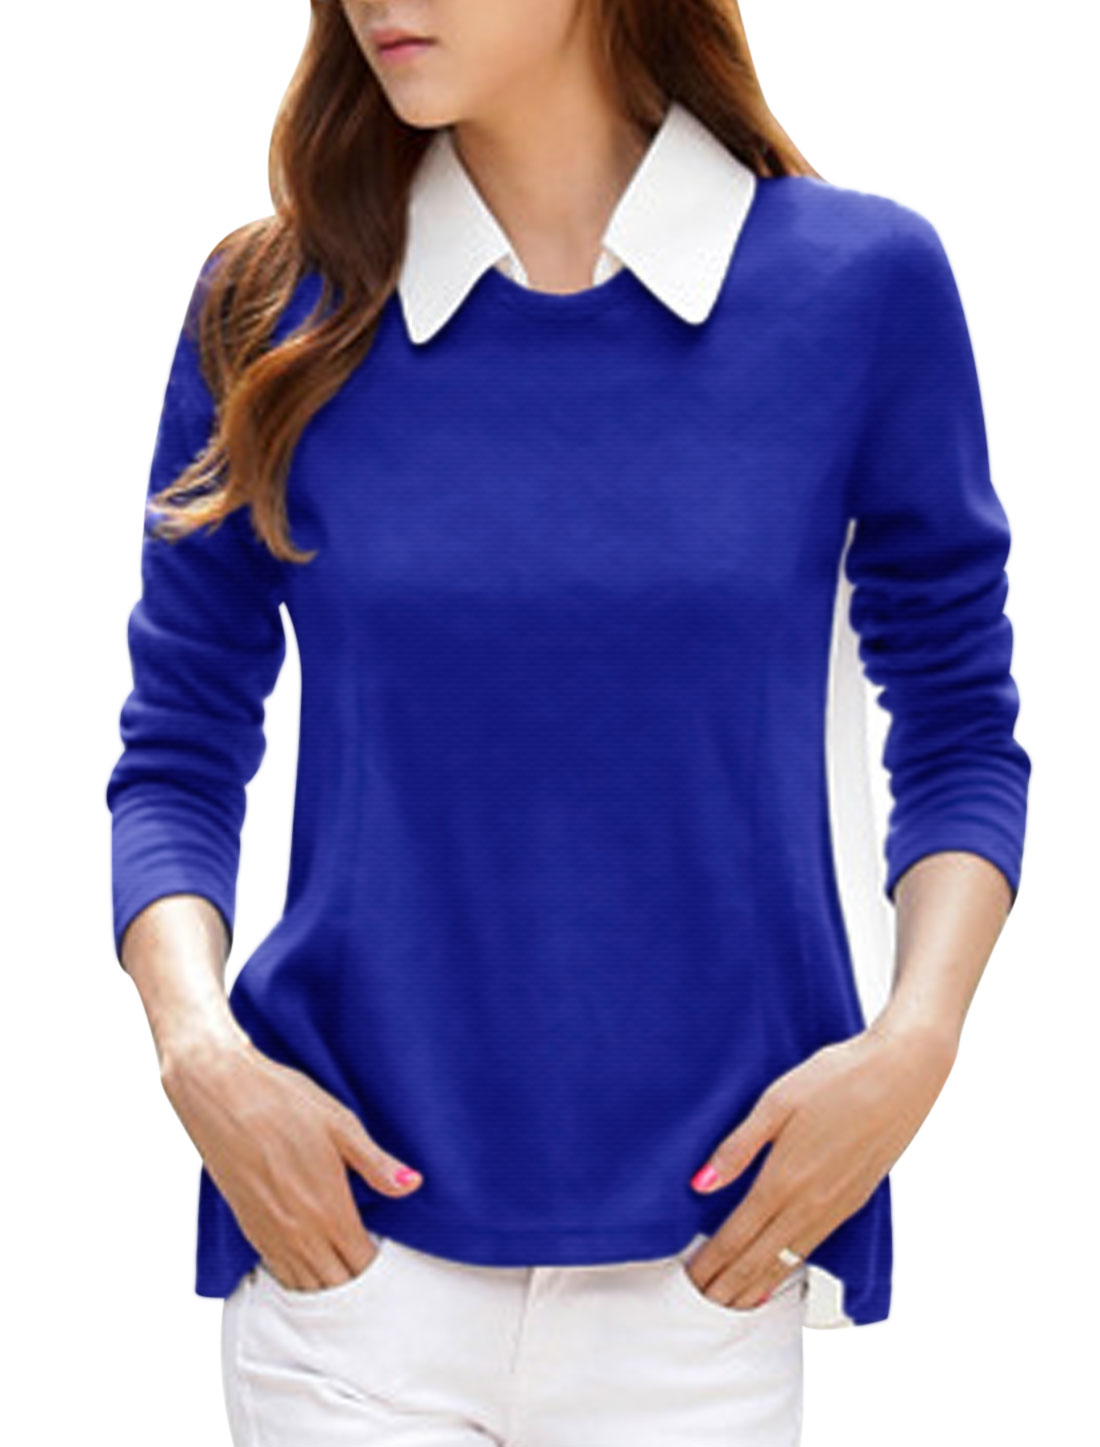 Ladies Royal Blue White Removable Turn Down Collar Long Sleeves Chiffon Splice Shirt XS